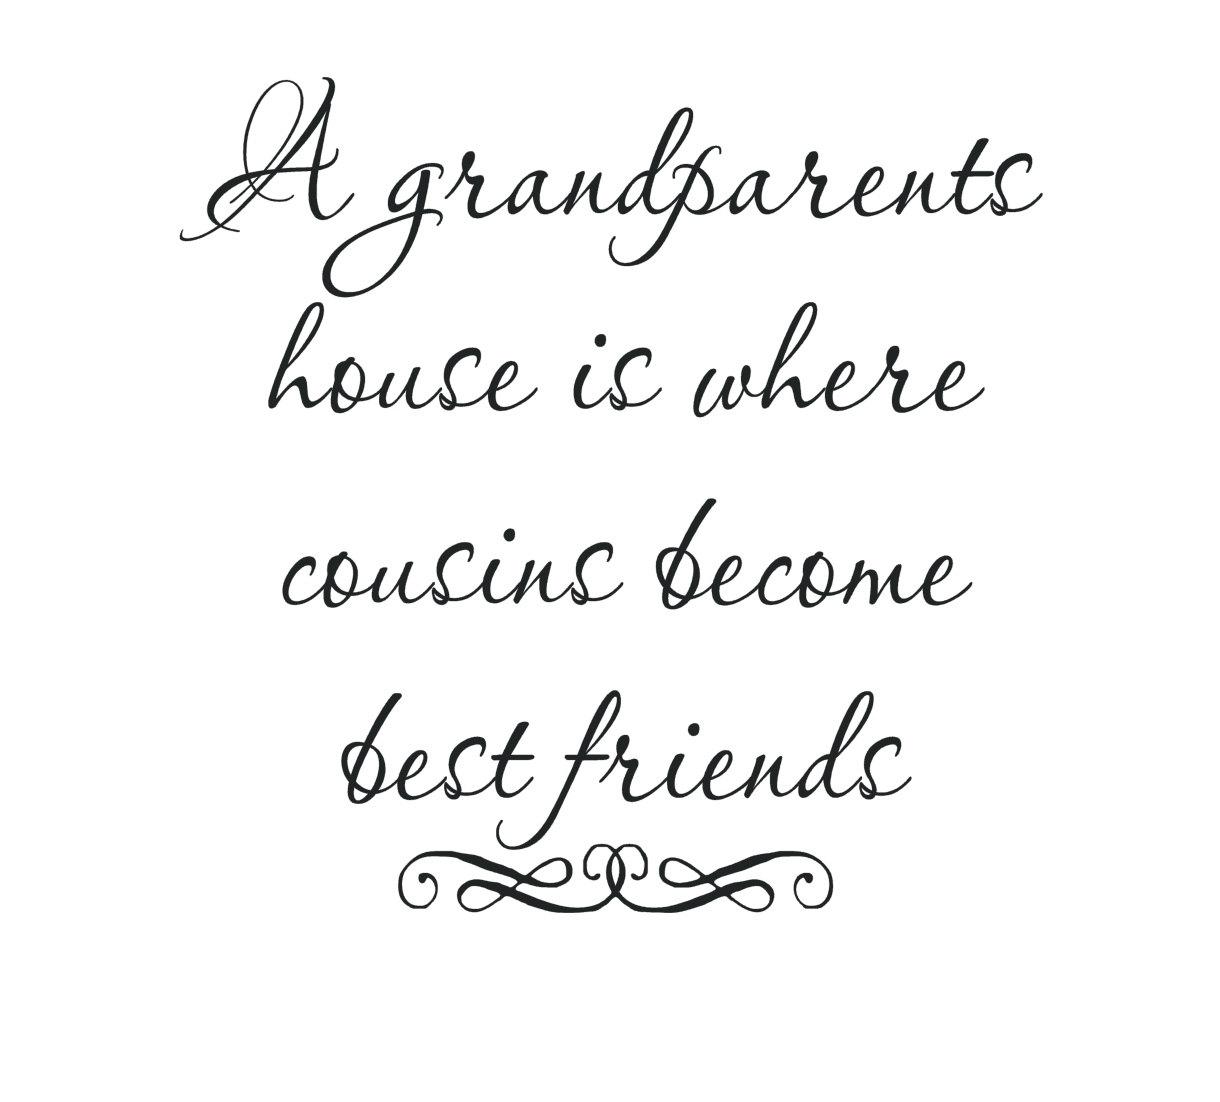 Cute Cousin Quotes For Instagram: Cute Cousin Quotes. QuotesGram